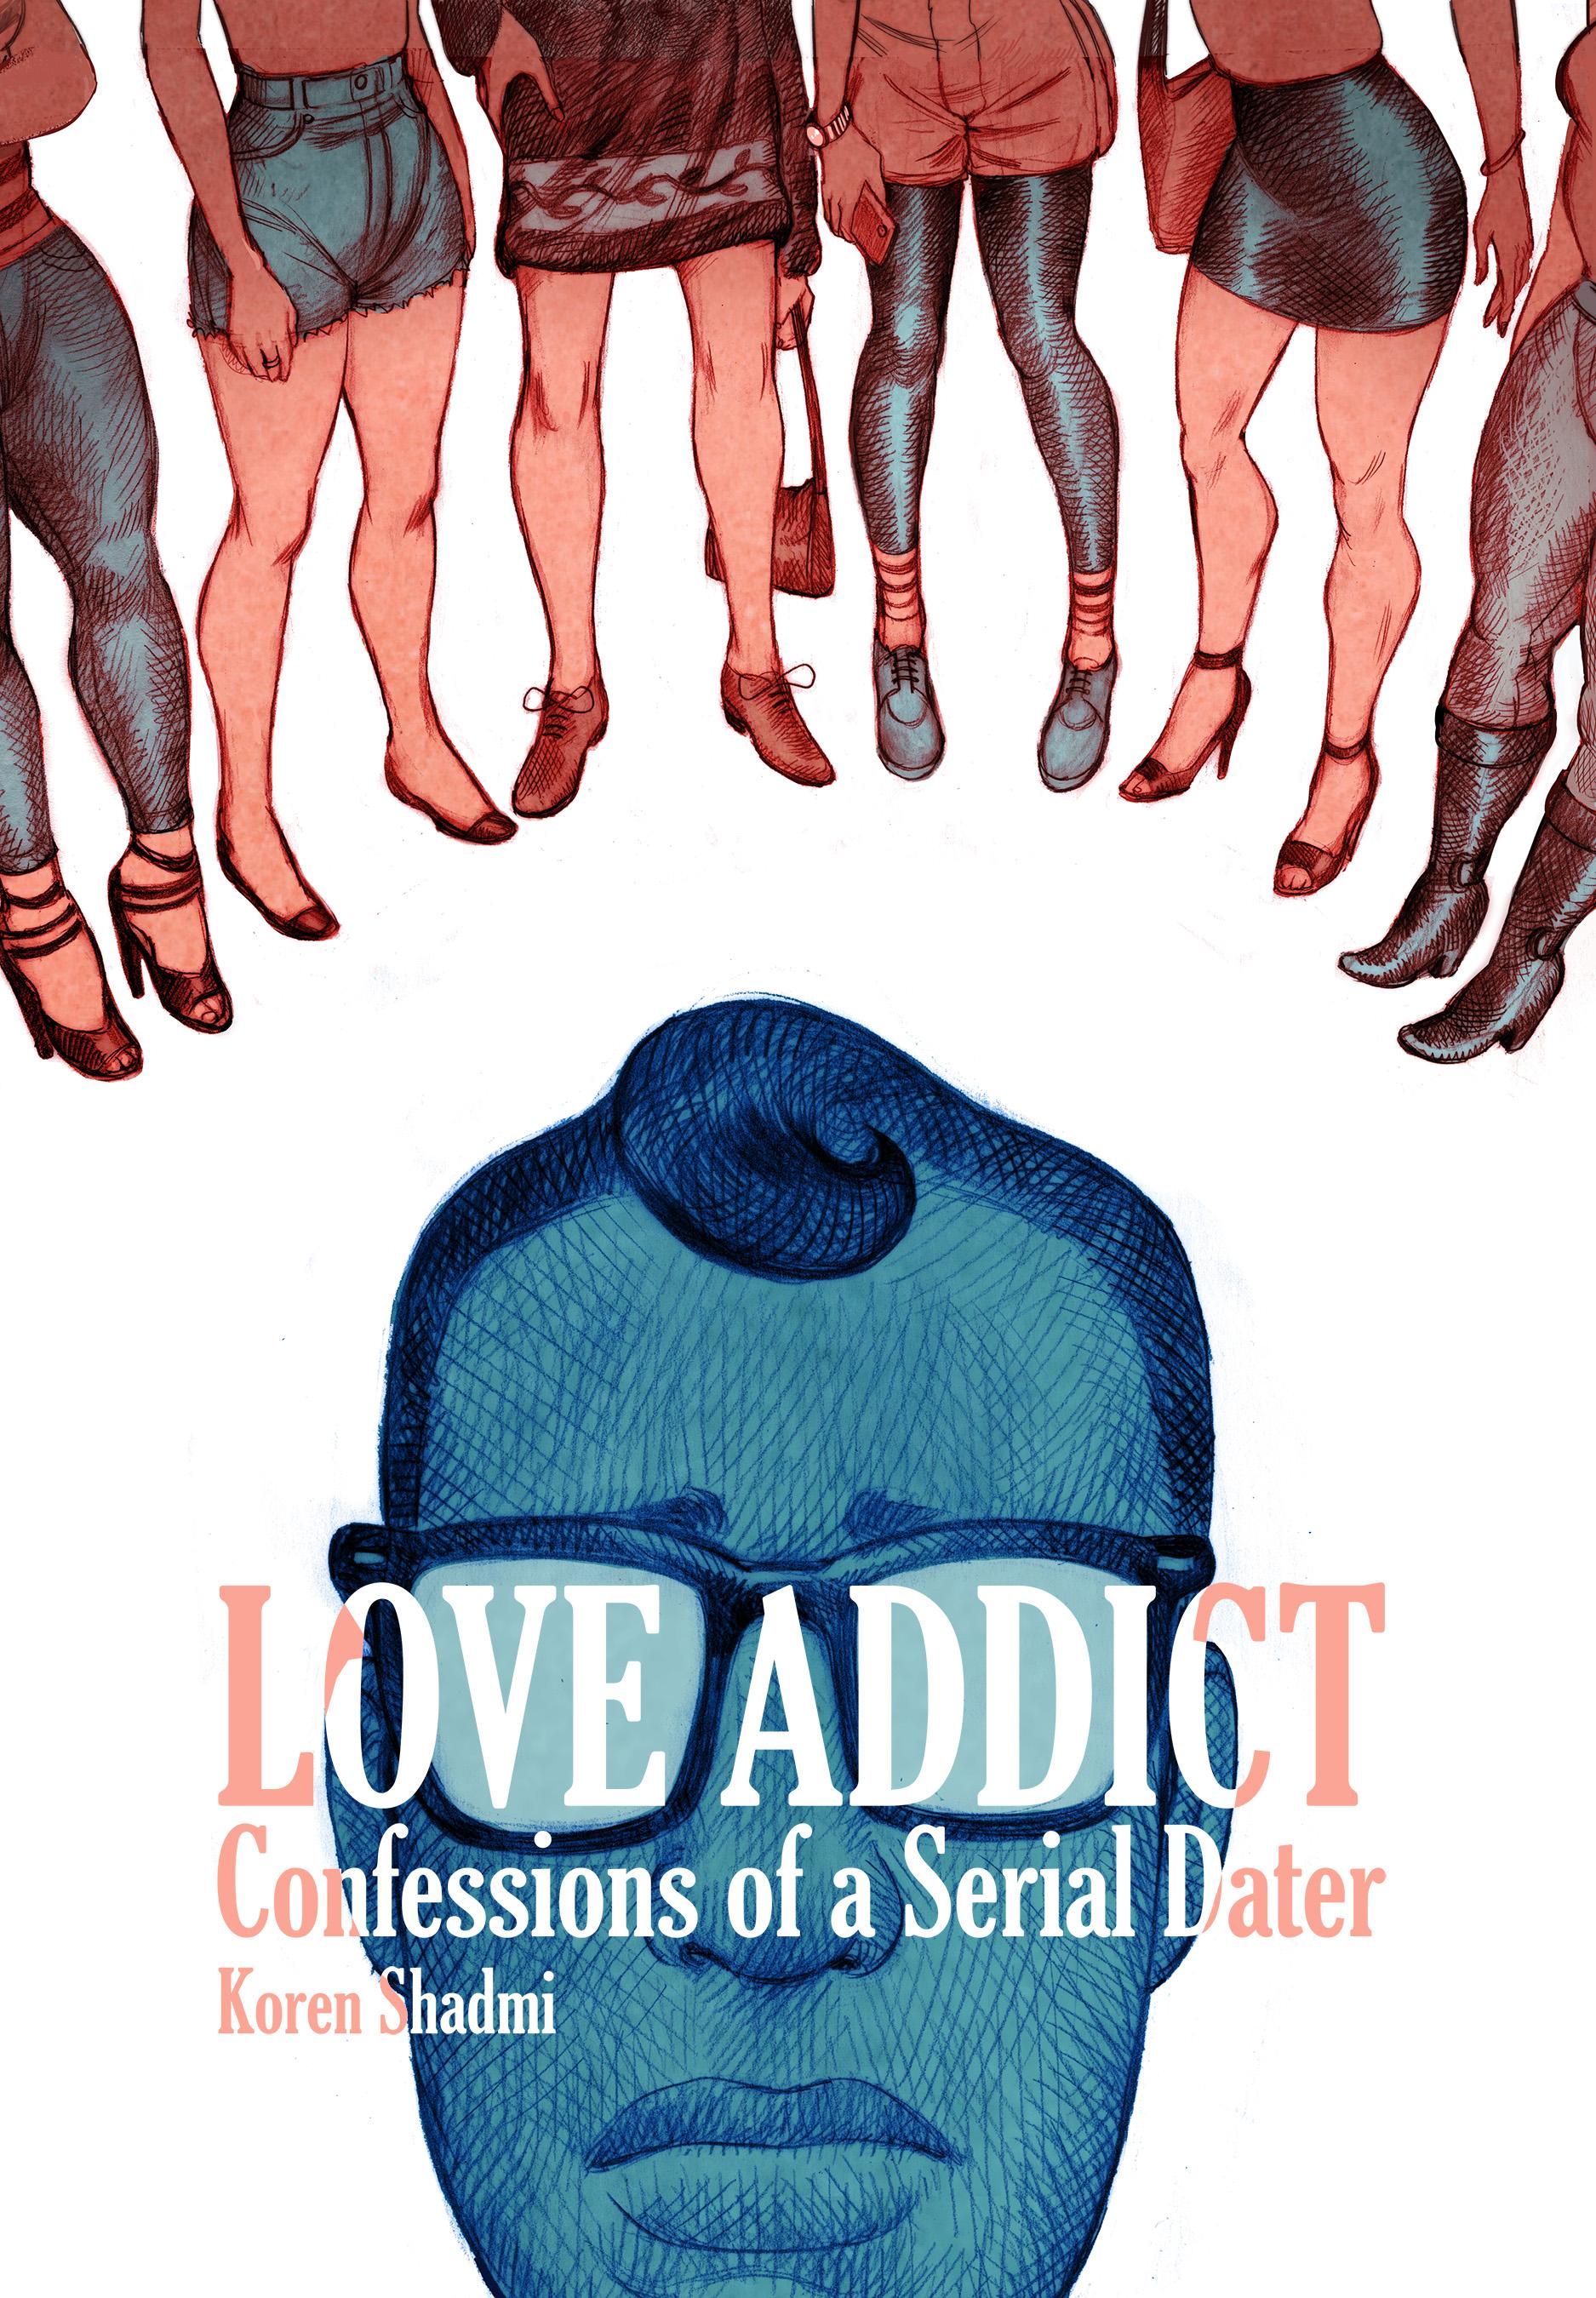 love-addict-300dpi-front-cover